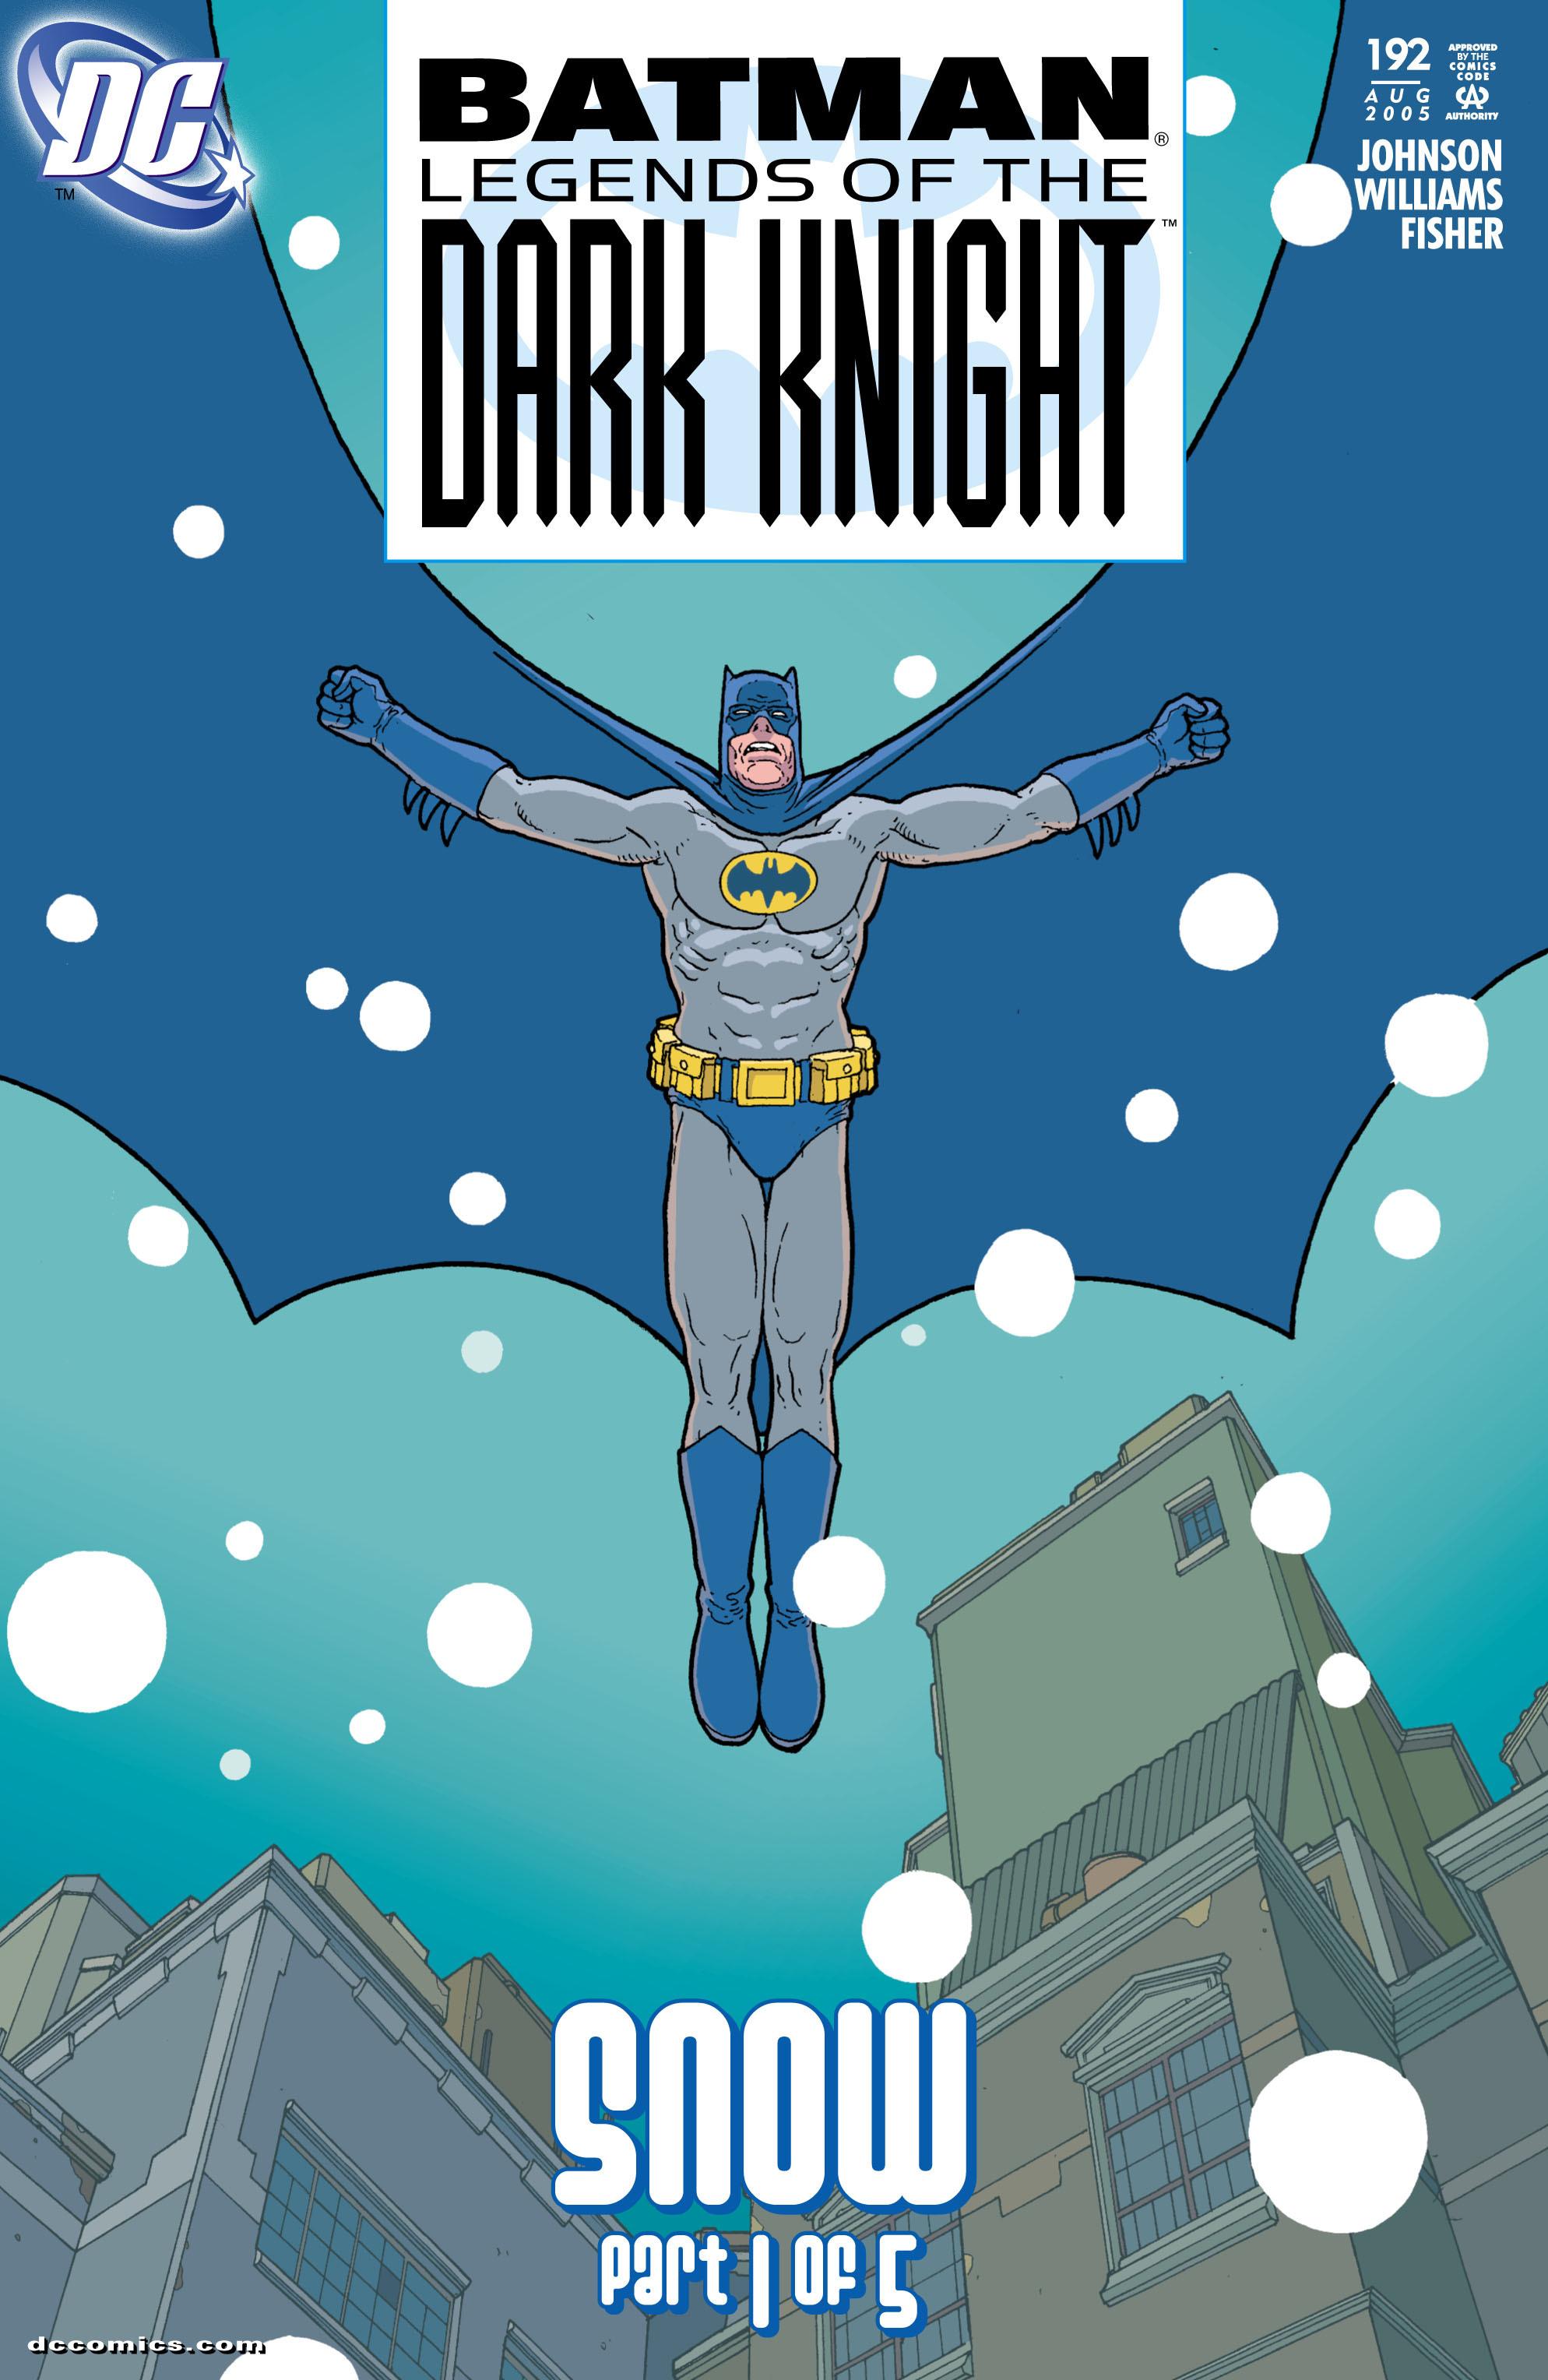 Batman: Legends of the Dark Knight 192 Page 1